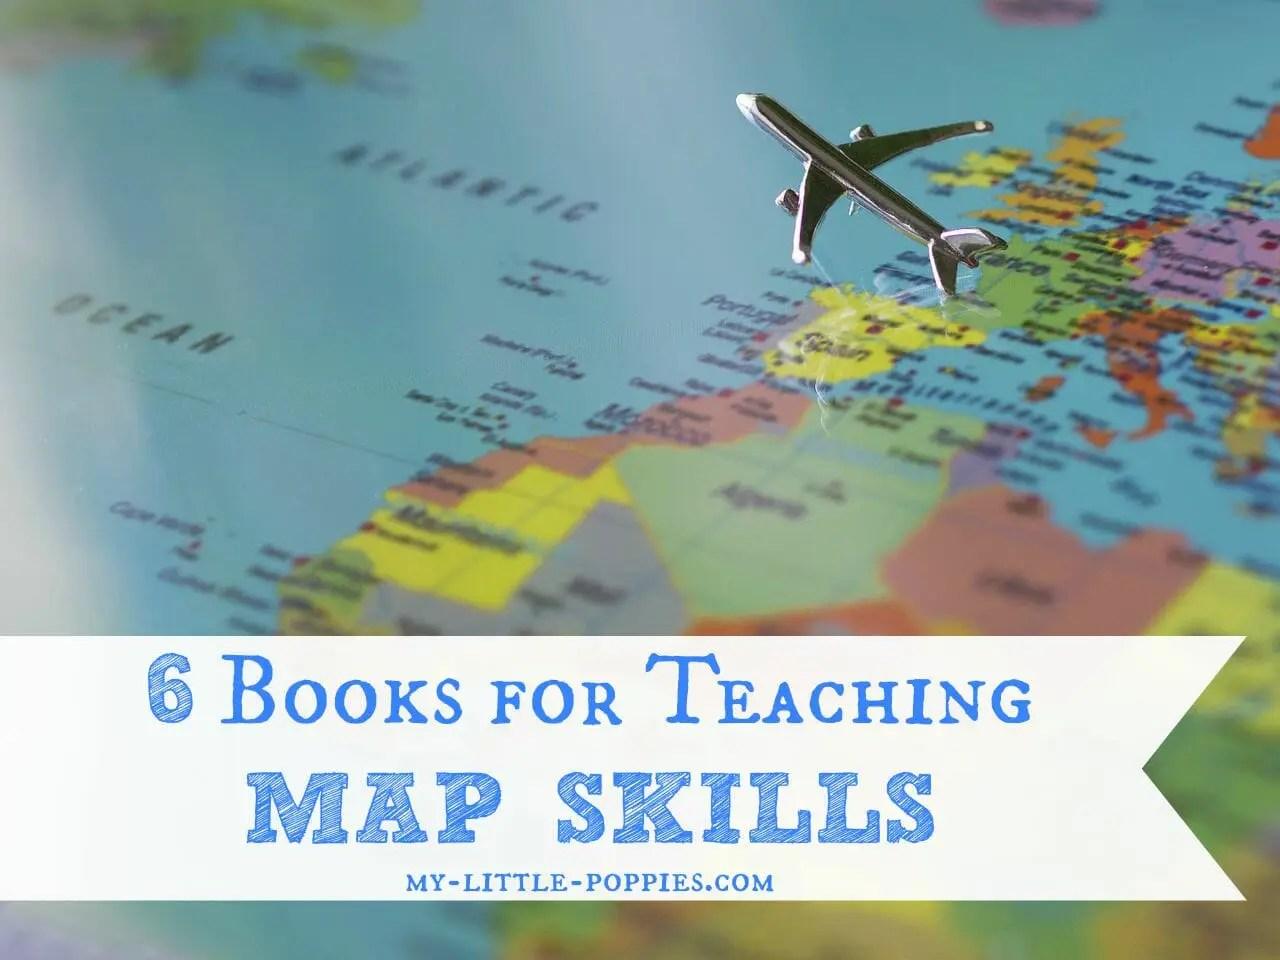 6 Books For Teaching Map Skills